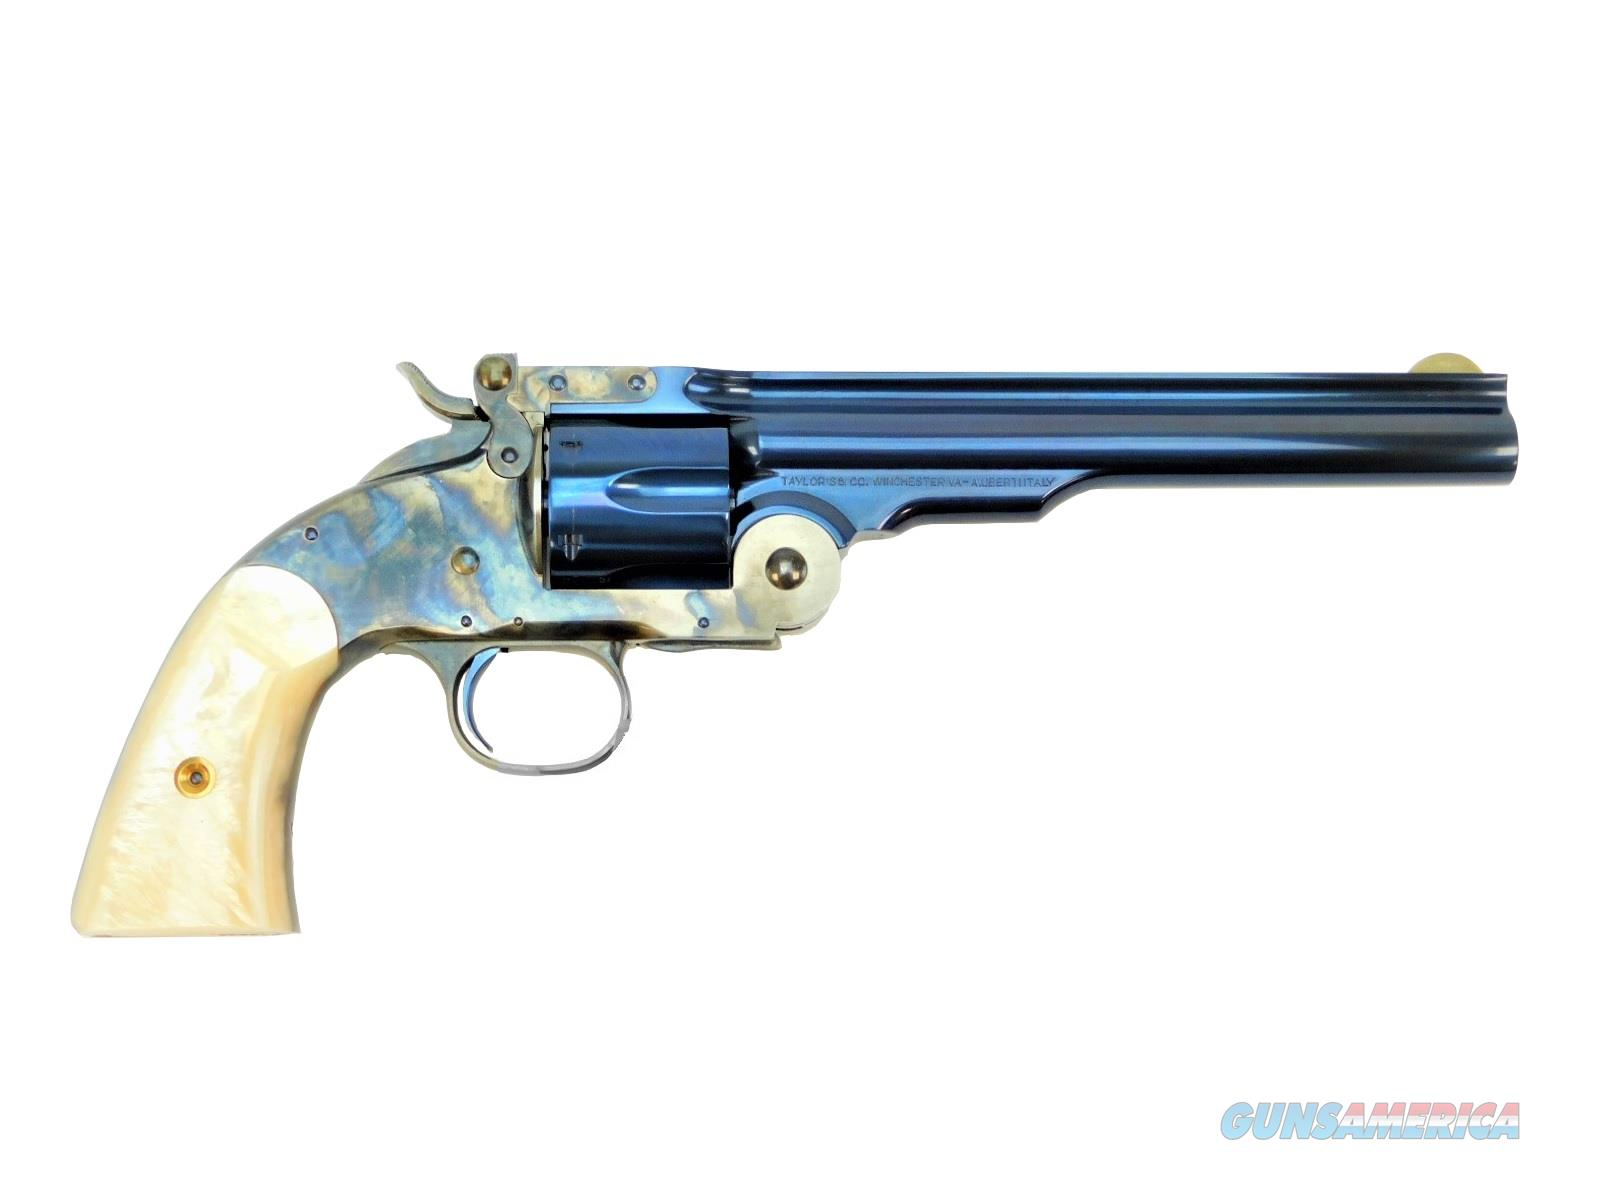 "Taylor's & Co. / Uberti Schofield Charcoal Blue .45 Colt 7"" Pearl Grips  Guns > Pistols > Taylors & Co. Pistols > Ctg."